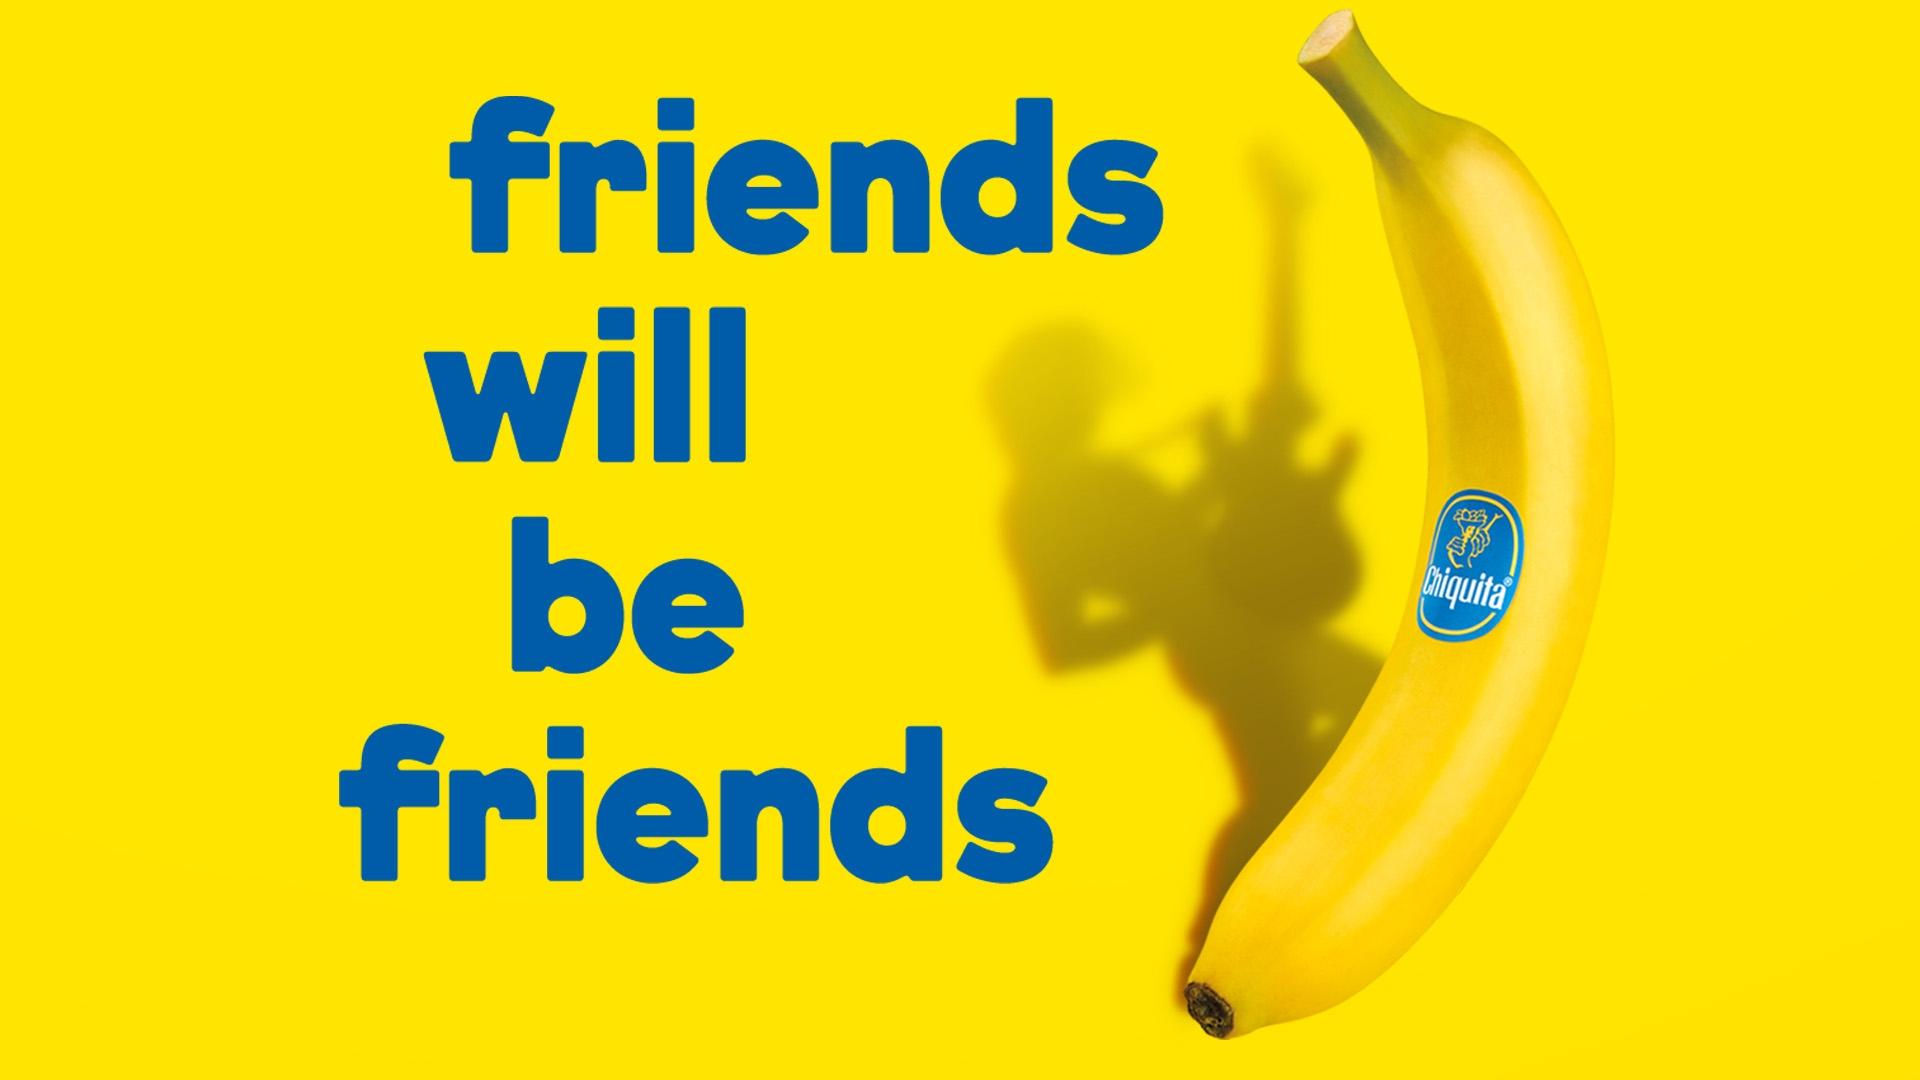 Chiquita Bananen Kampagne